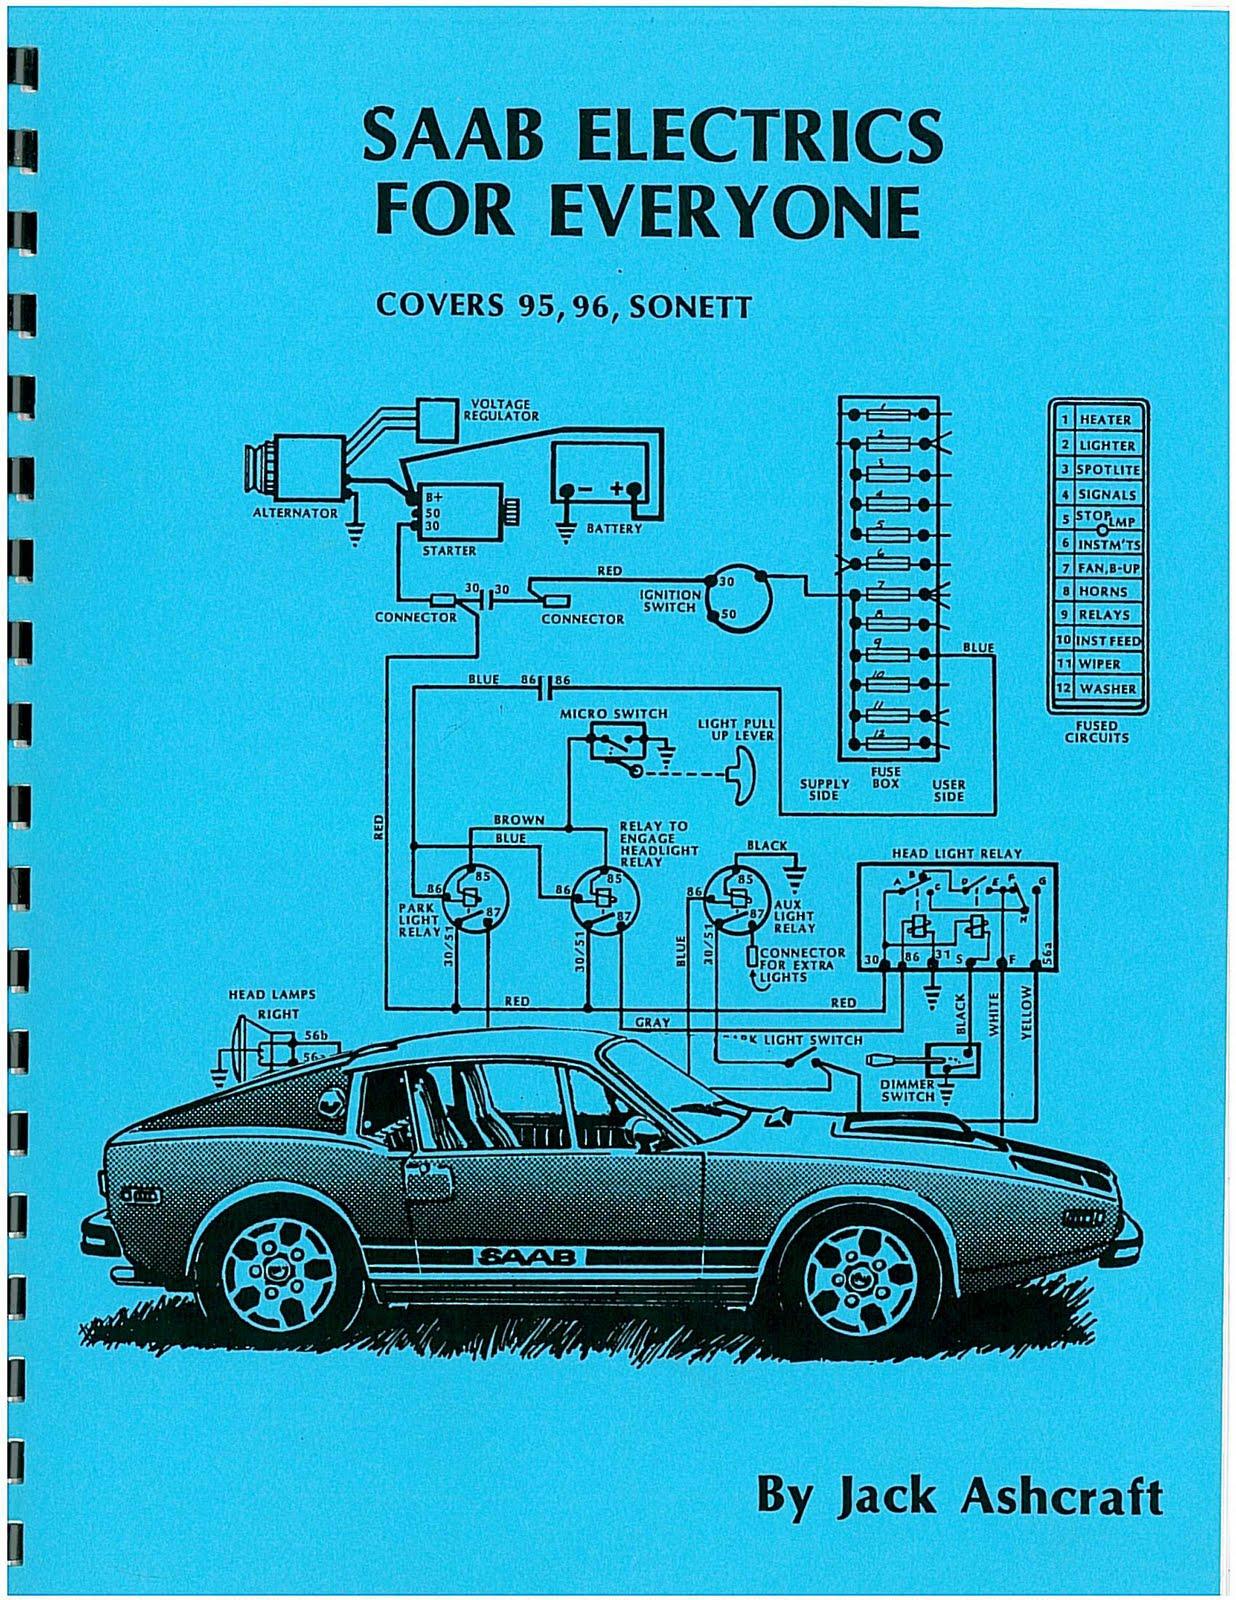 Saab Sonett Wiring Diagram Reinvent Your 1999 Journal Electrics Rh Saabjournal Blogspot Com 9 5